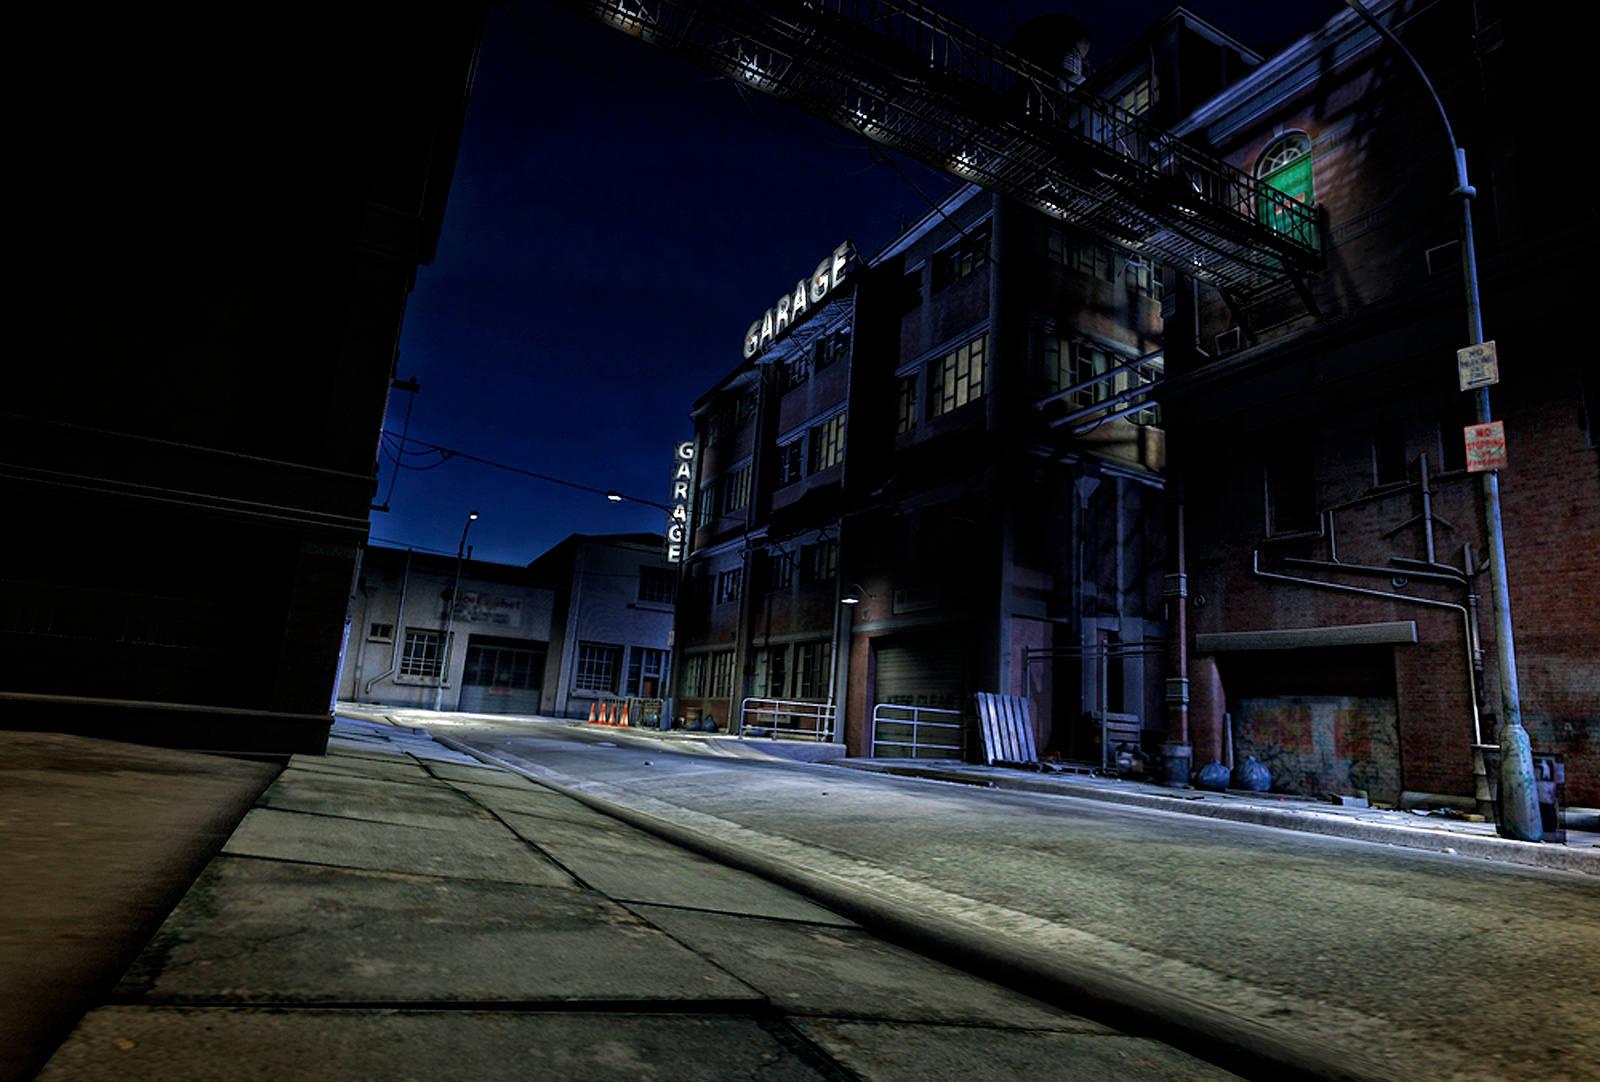 city streets 1 by indigodeep